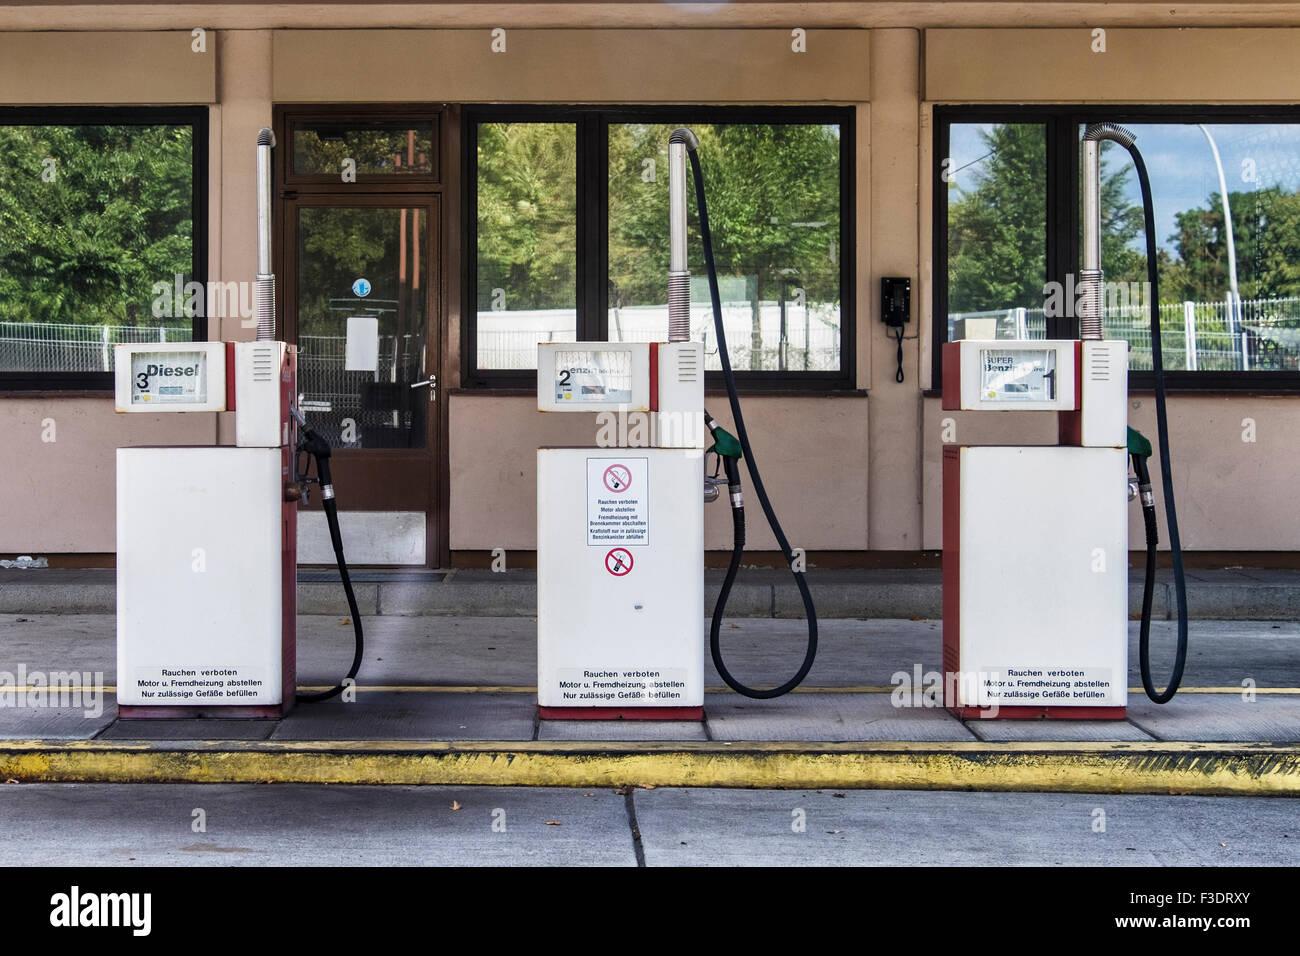 Berlin Tempelhof Airport, Flughafen - obsolete abandoned petrol pumps at fuel service station - Stock Image